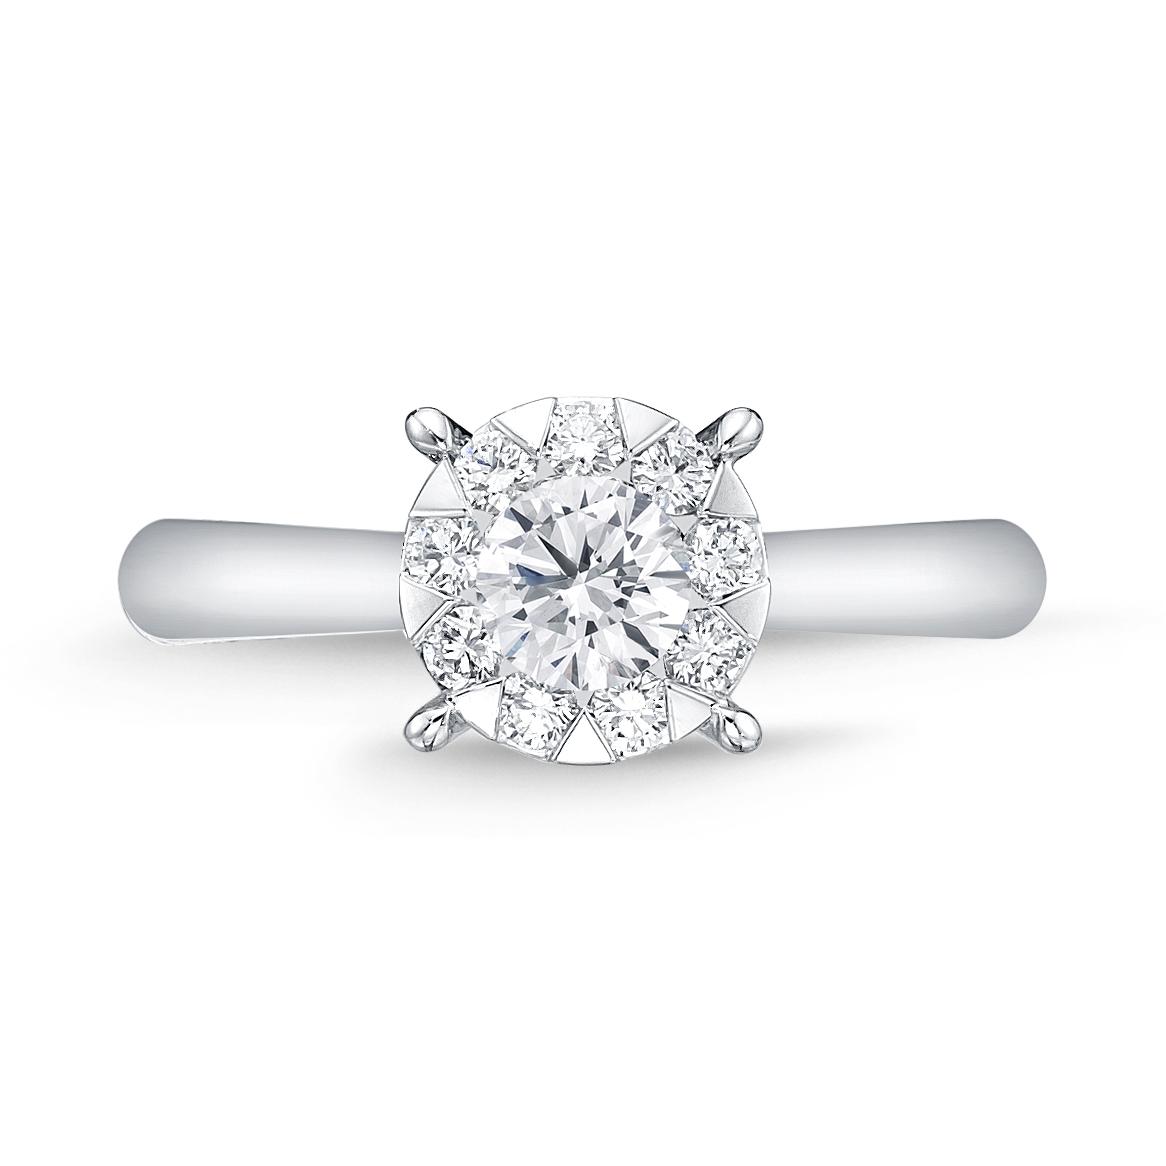 Memoire 18ct White Gold 0.60 Carat Diamond Bouquet Solitaire Ring